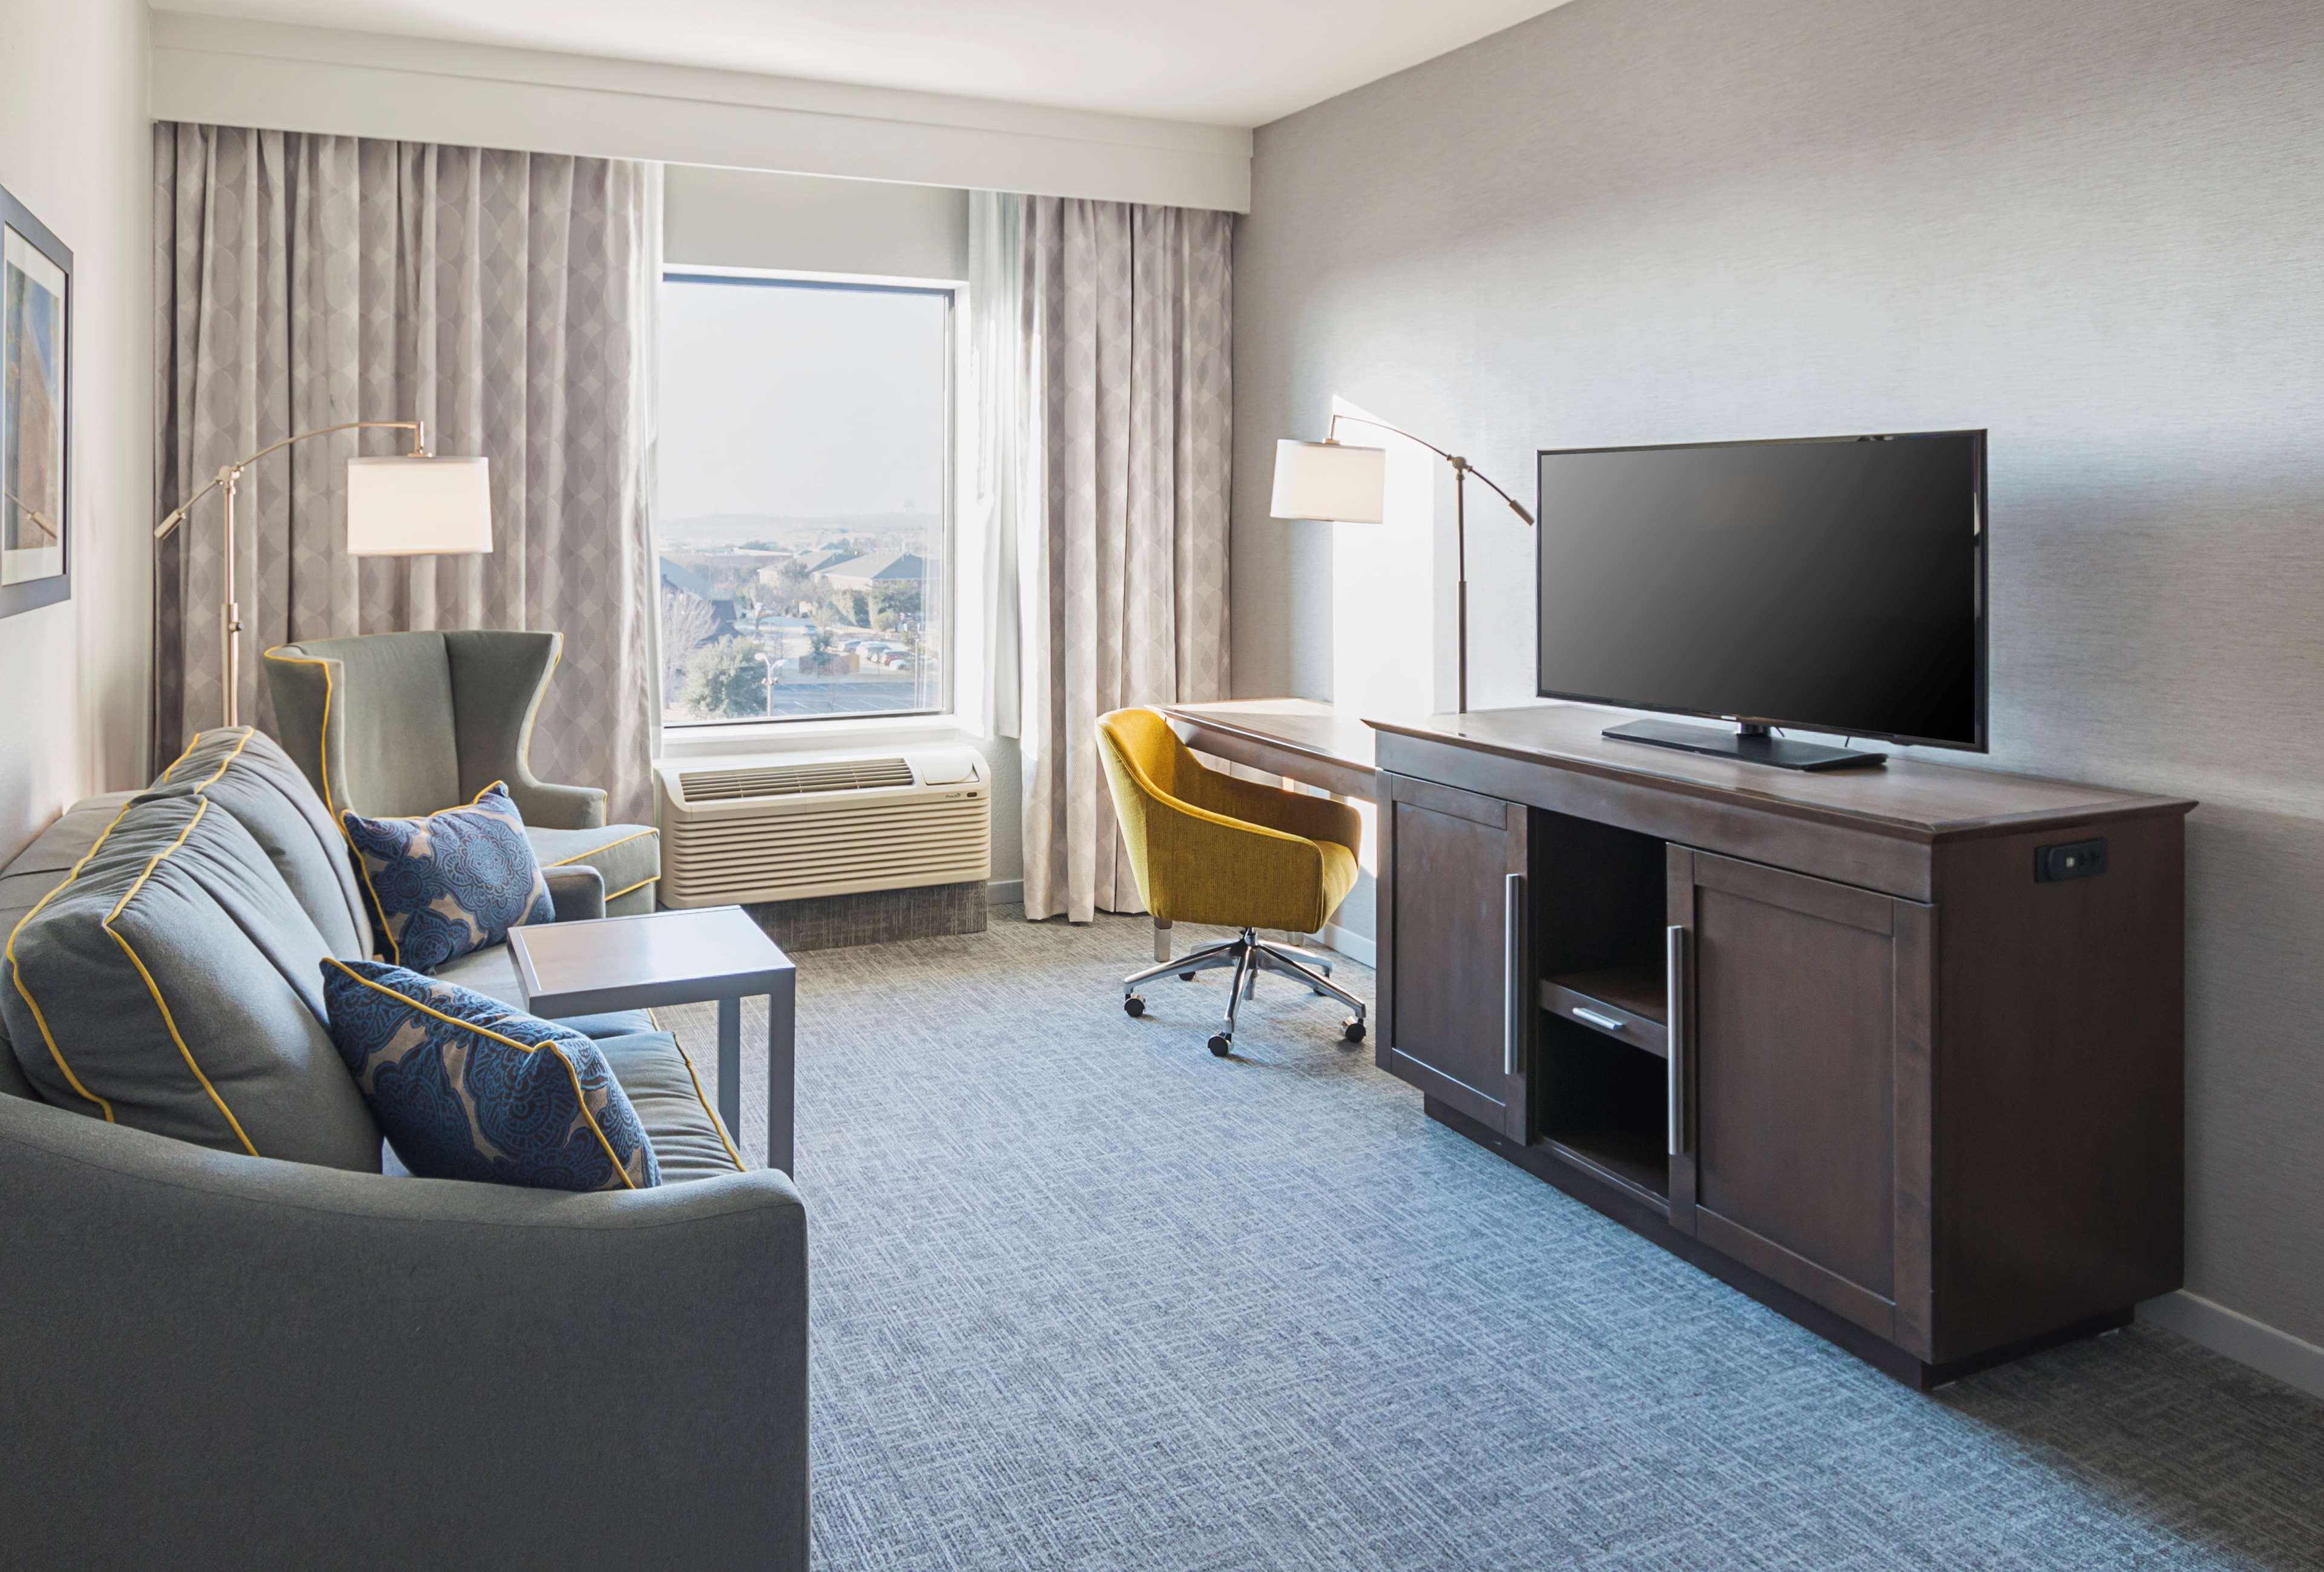 Hampton Inn & Suites Colleyville DFW West image 33